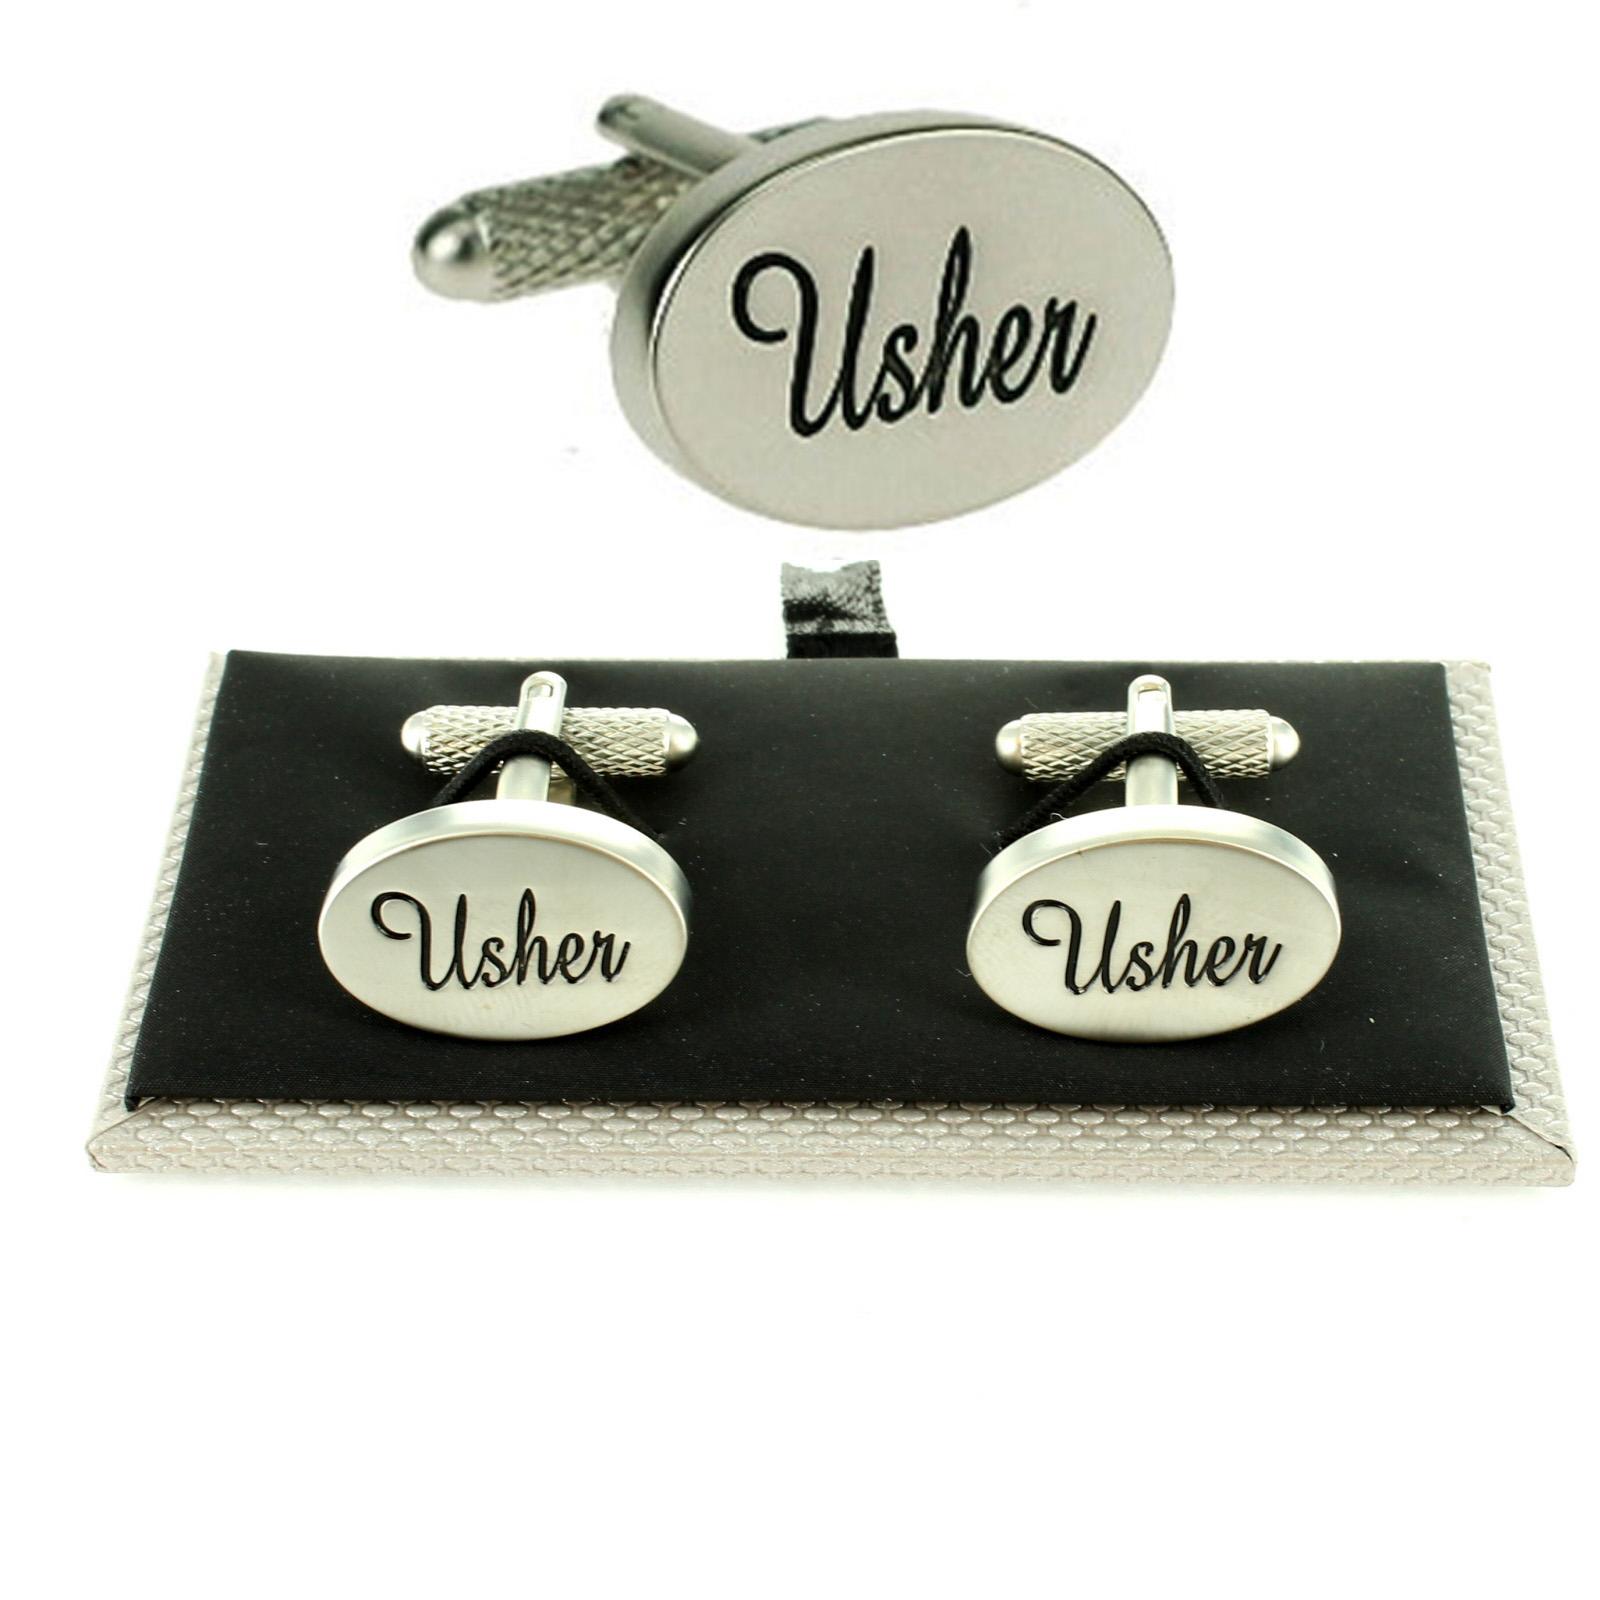 Mens Oval Silver Wedding Cufflinks Gift Box Boxed Usher Groom Best Man Kit Set